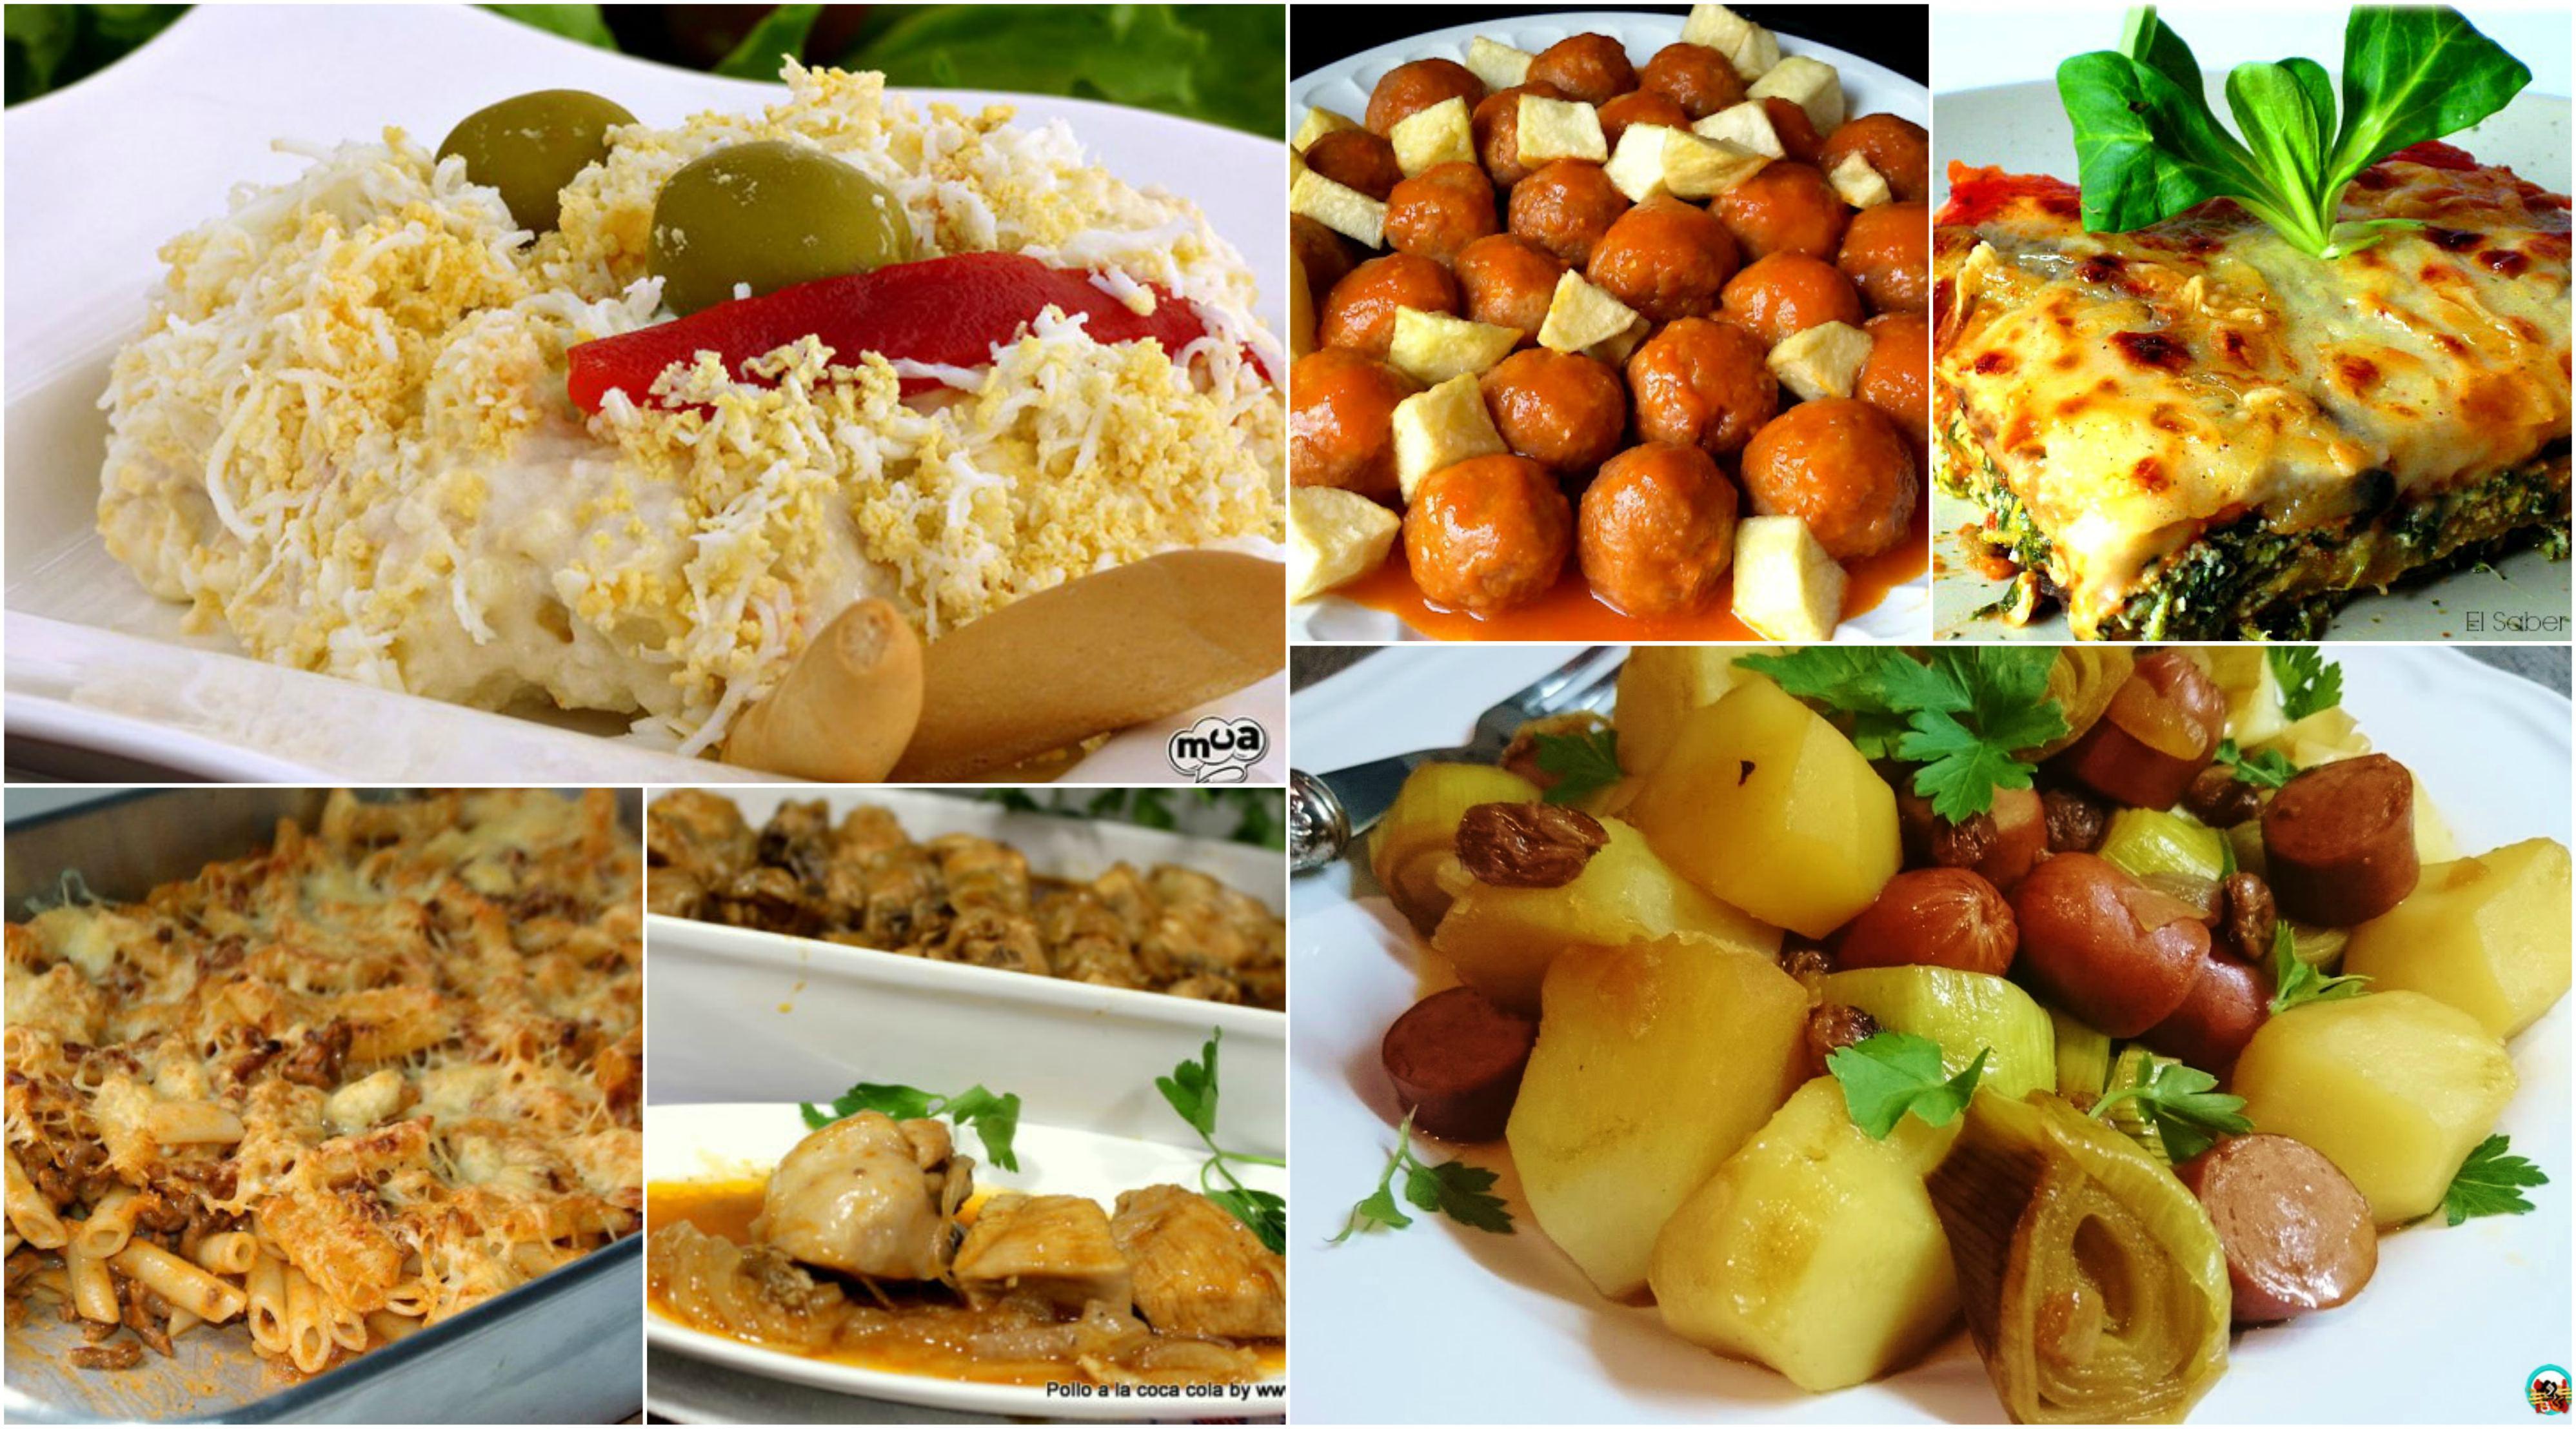 menú semanal 48